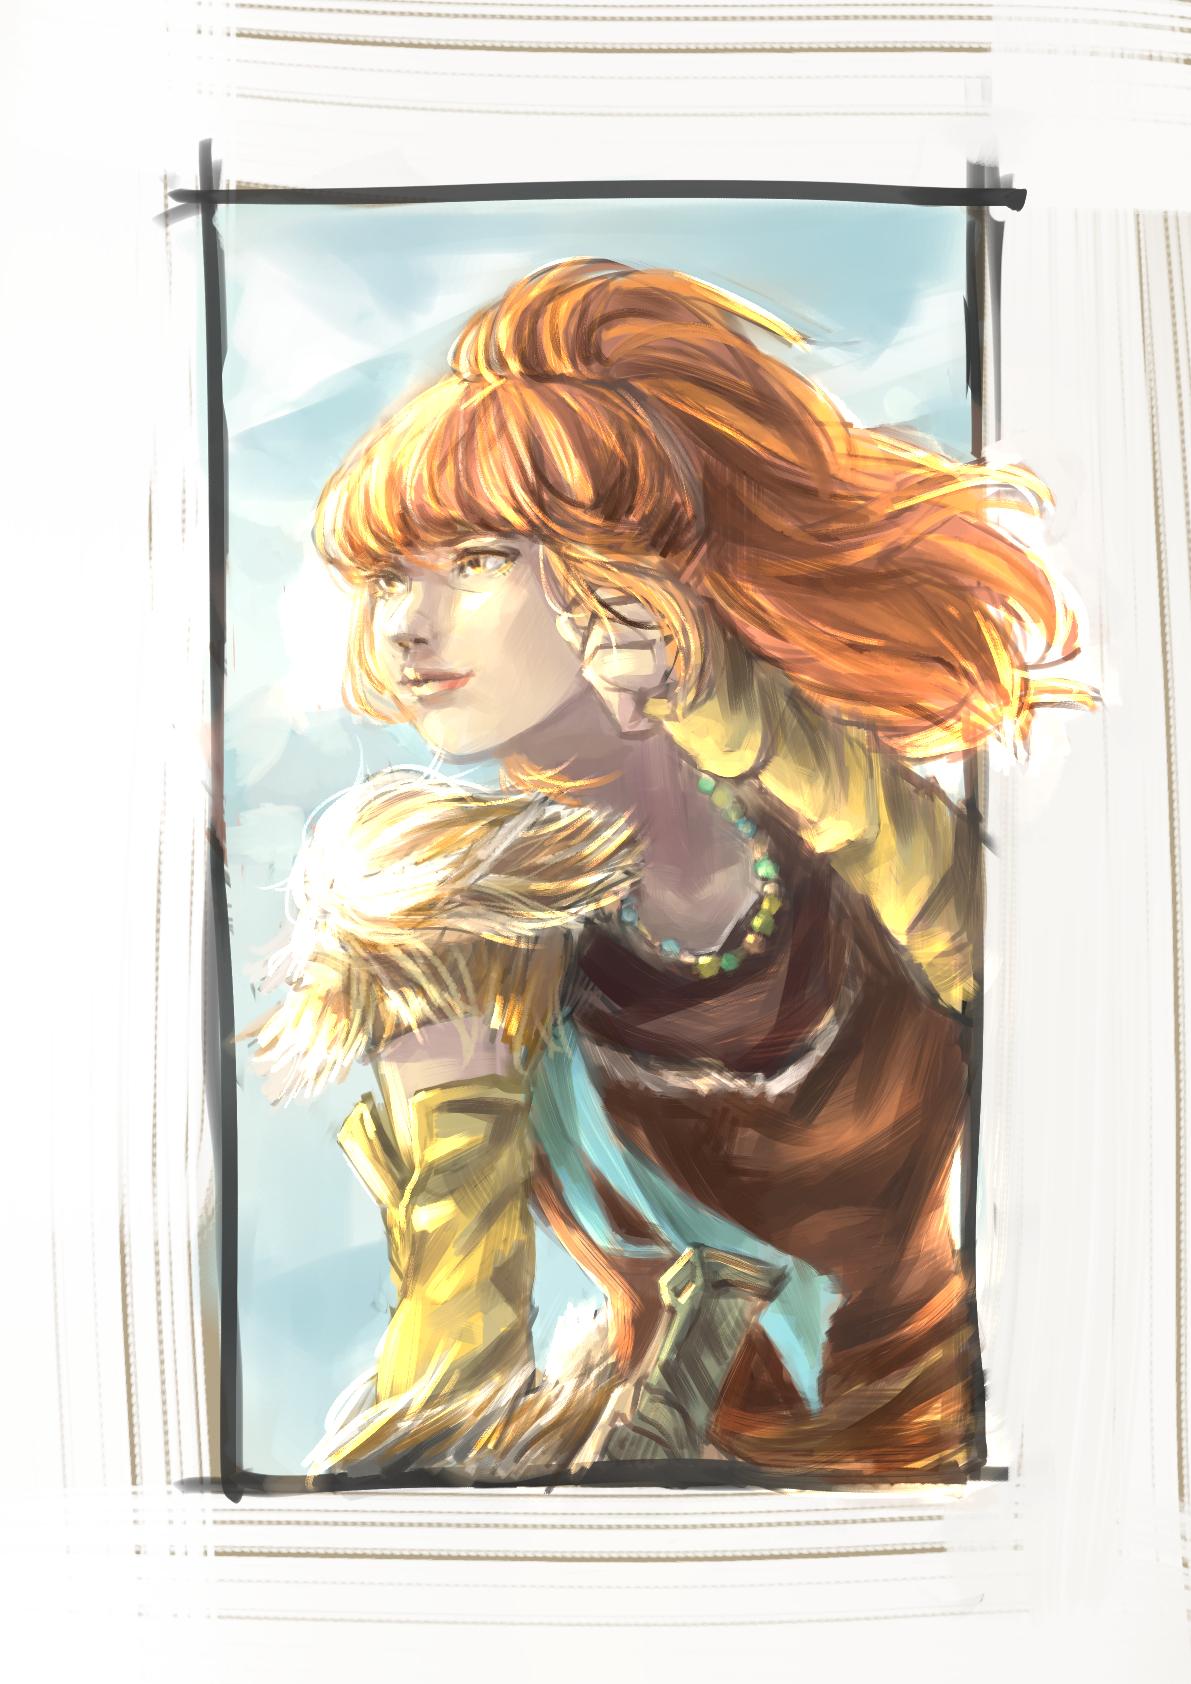 Aloy Horizon Zero Dawn Image 2458564 Zerochan Anime